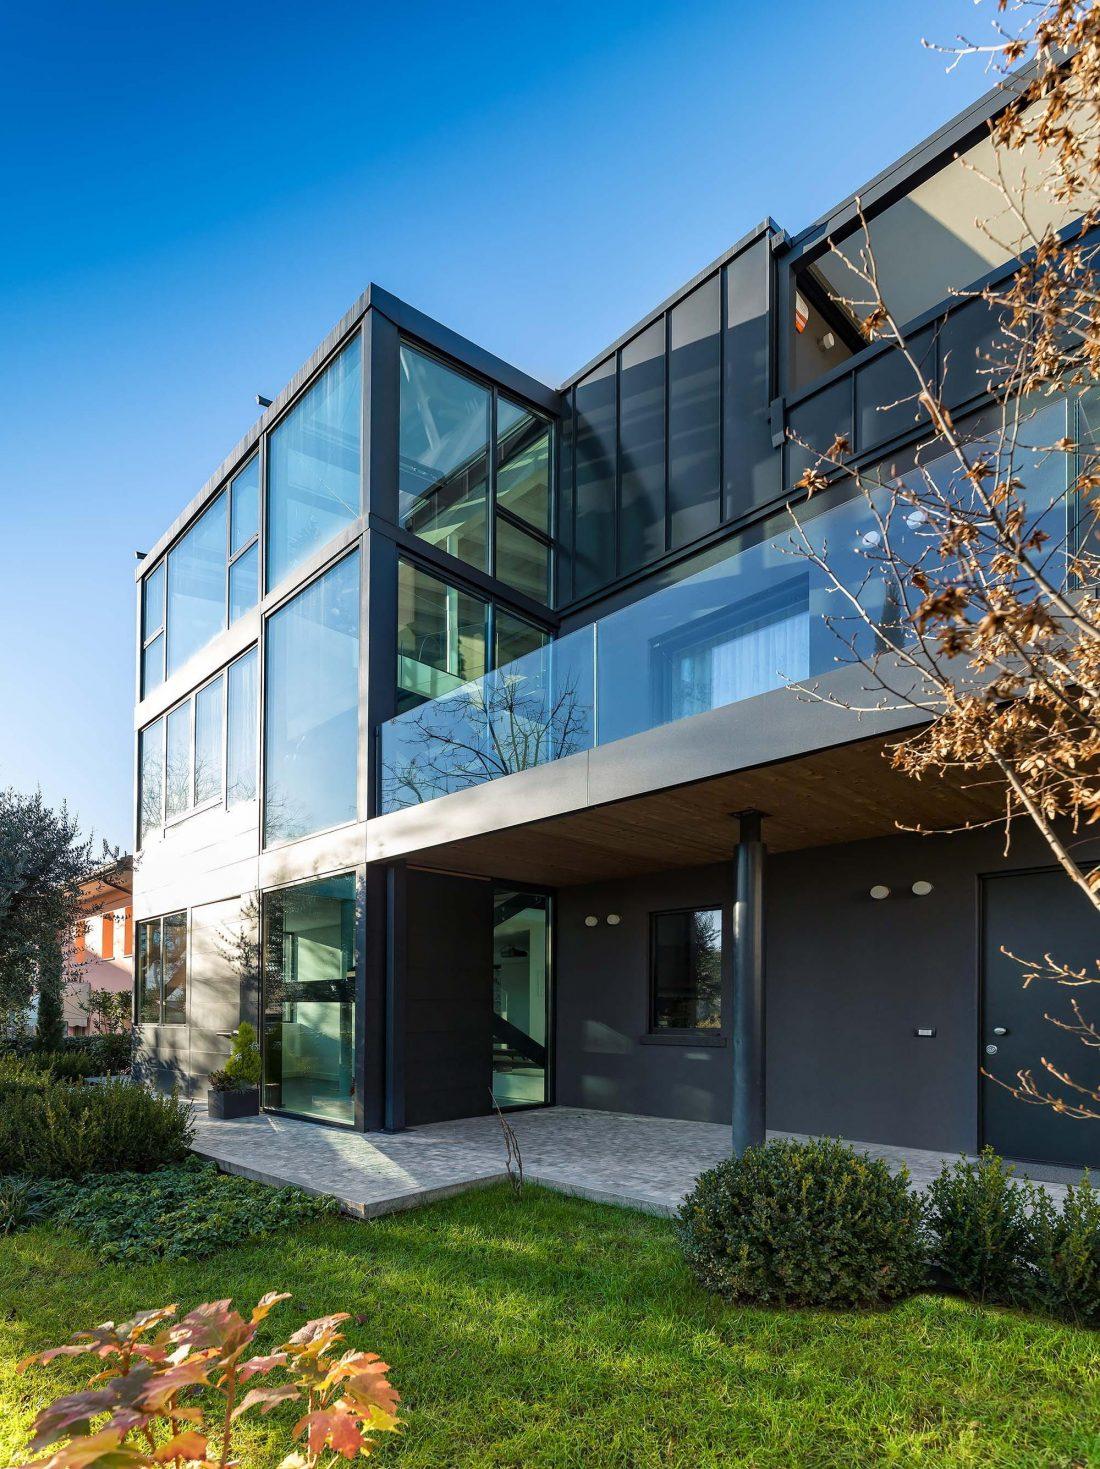 Дом в Порденоне, Италия, от студии Caprioglio Associati Architects 8